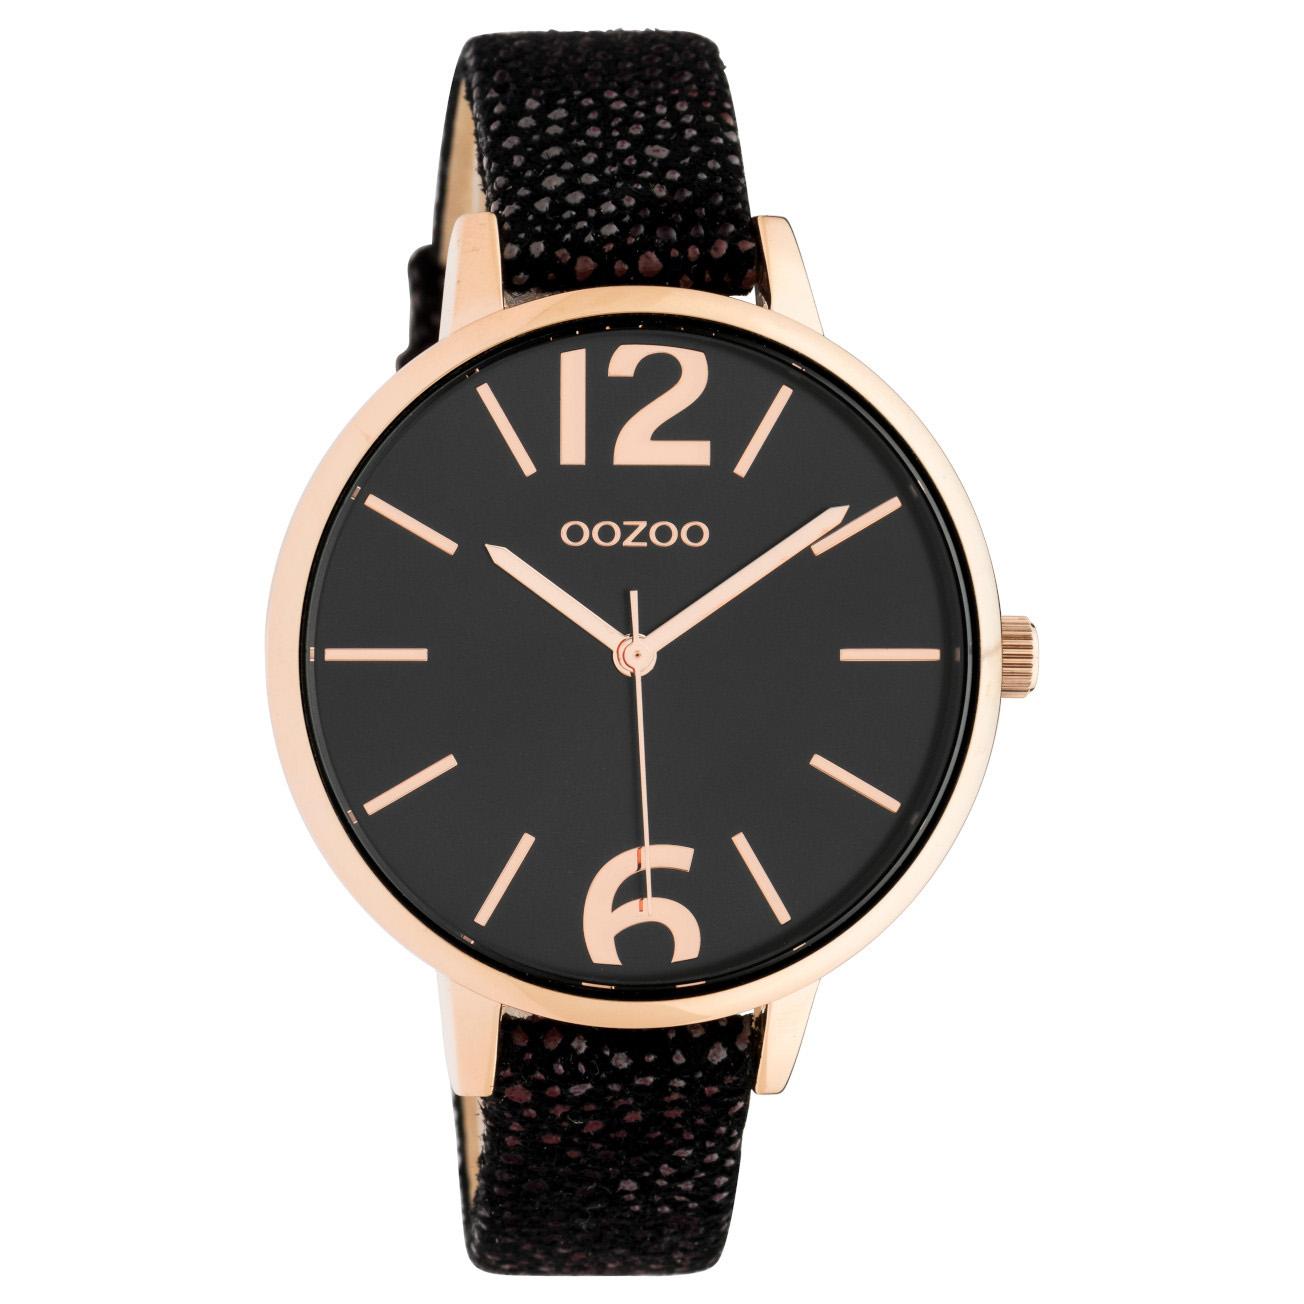 OOZOO C10438 Horloge Timepiece Collection Black-Bronze 42 mm